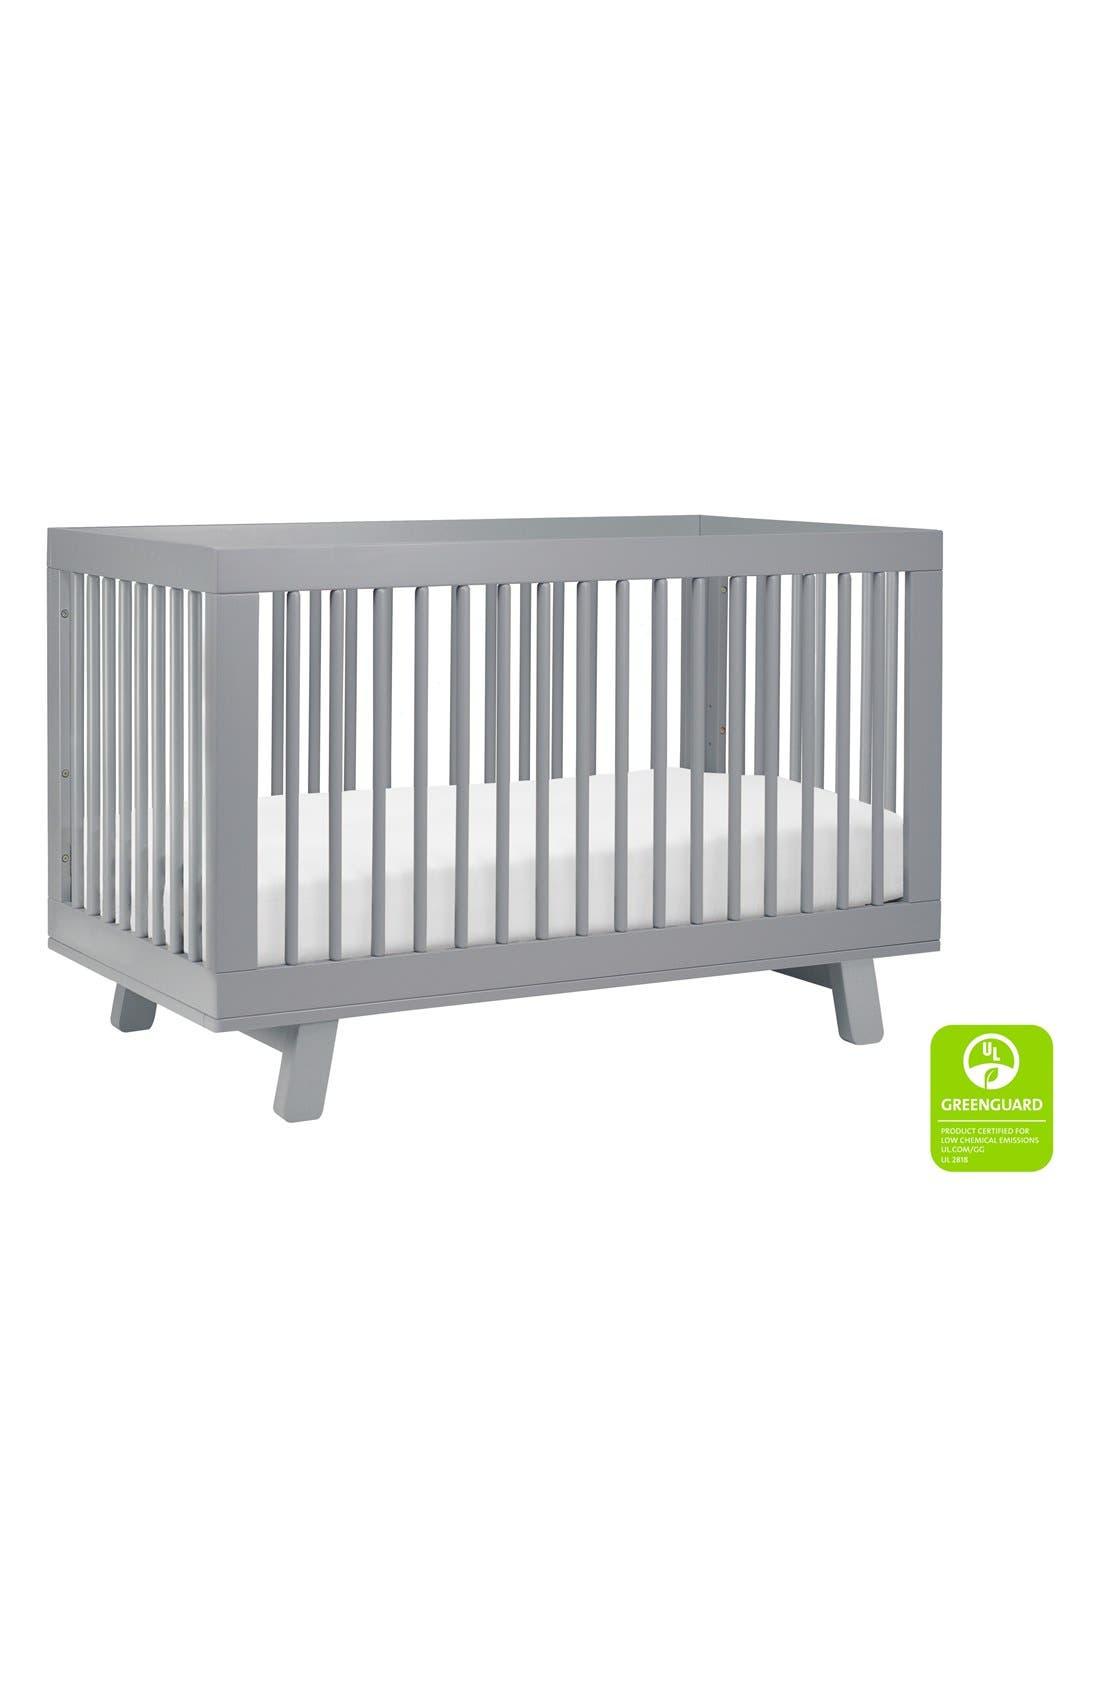 'Hudson' 3-in-1 Convertible Crib,                             Alternate thumbnail 23, color,